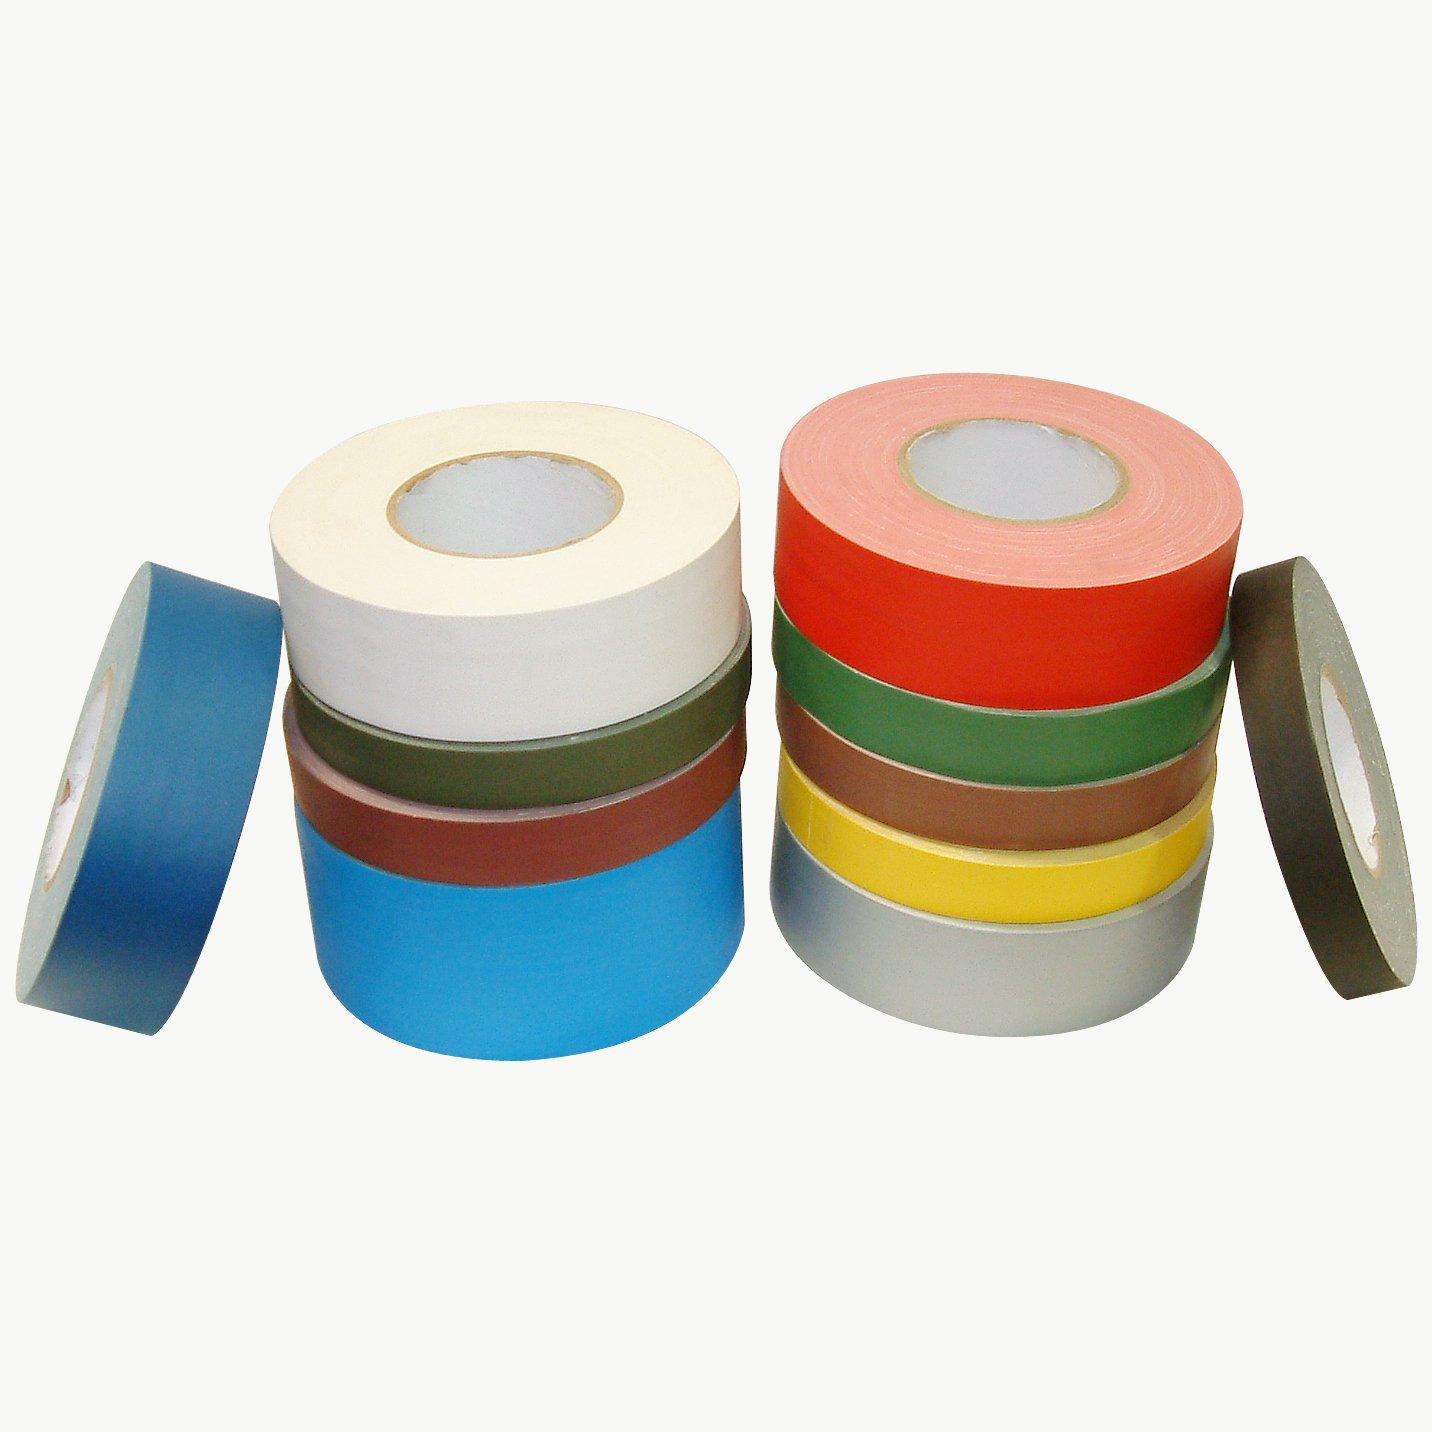 J.V. Converting J90/BLK360 JVCC J90 Polyethylene Coated Cloth Low Gloss Gaffer-Style Duct Tape, 36 lb. per inch Tensile Strength, 60 yd. Length x 3'' Width